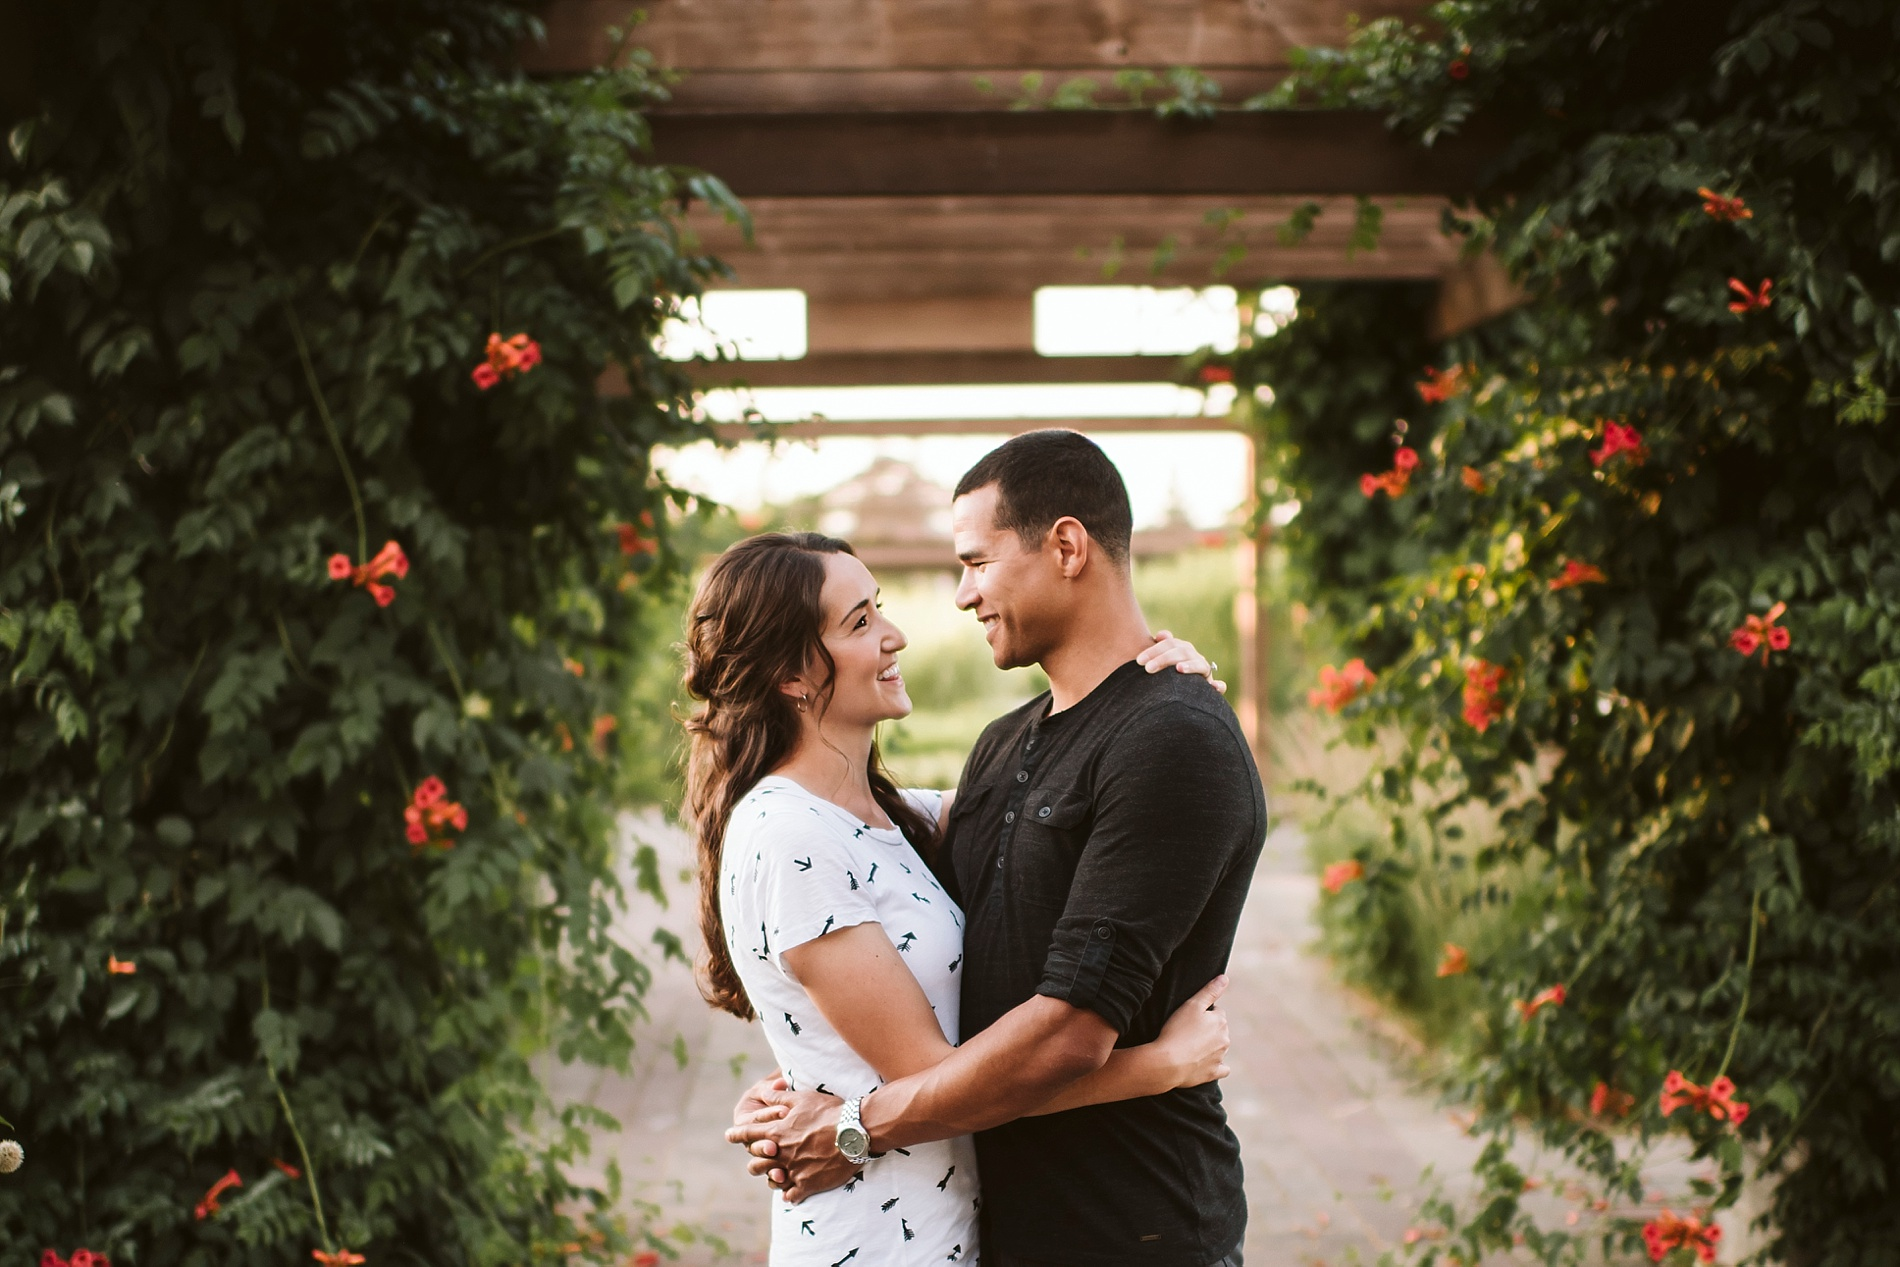 Richmond_Green_Engagement_shoot_Toronto_Wedding_Photographer10.jpg